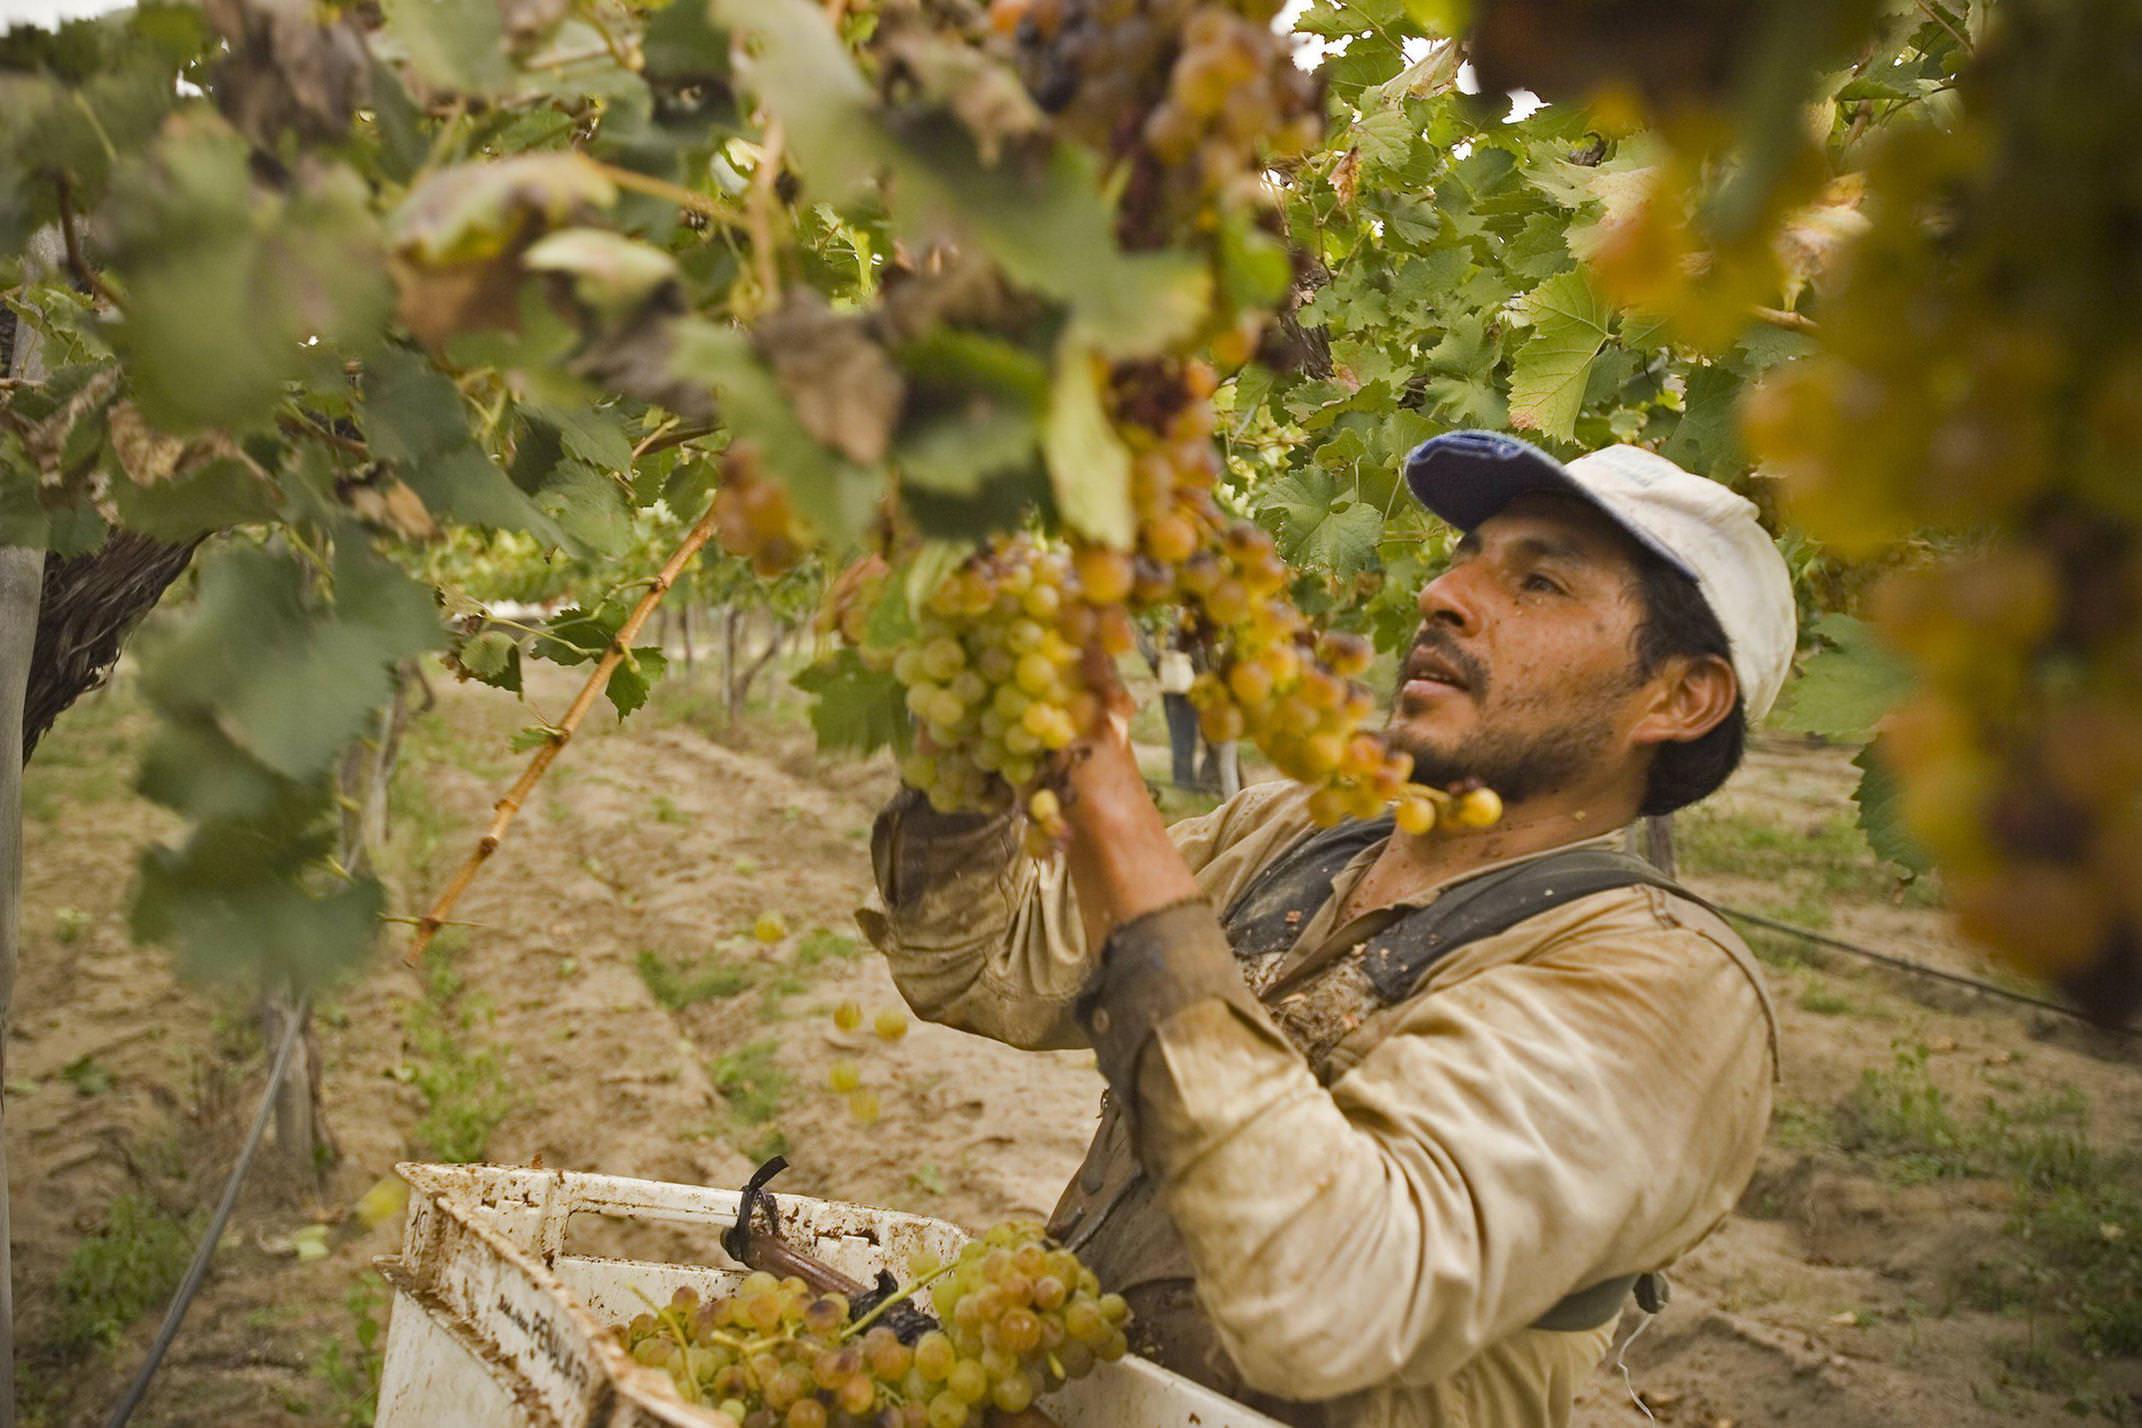 Argentina salta cafayate vinyard wine grape harvest